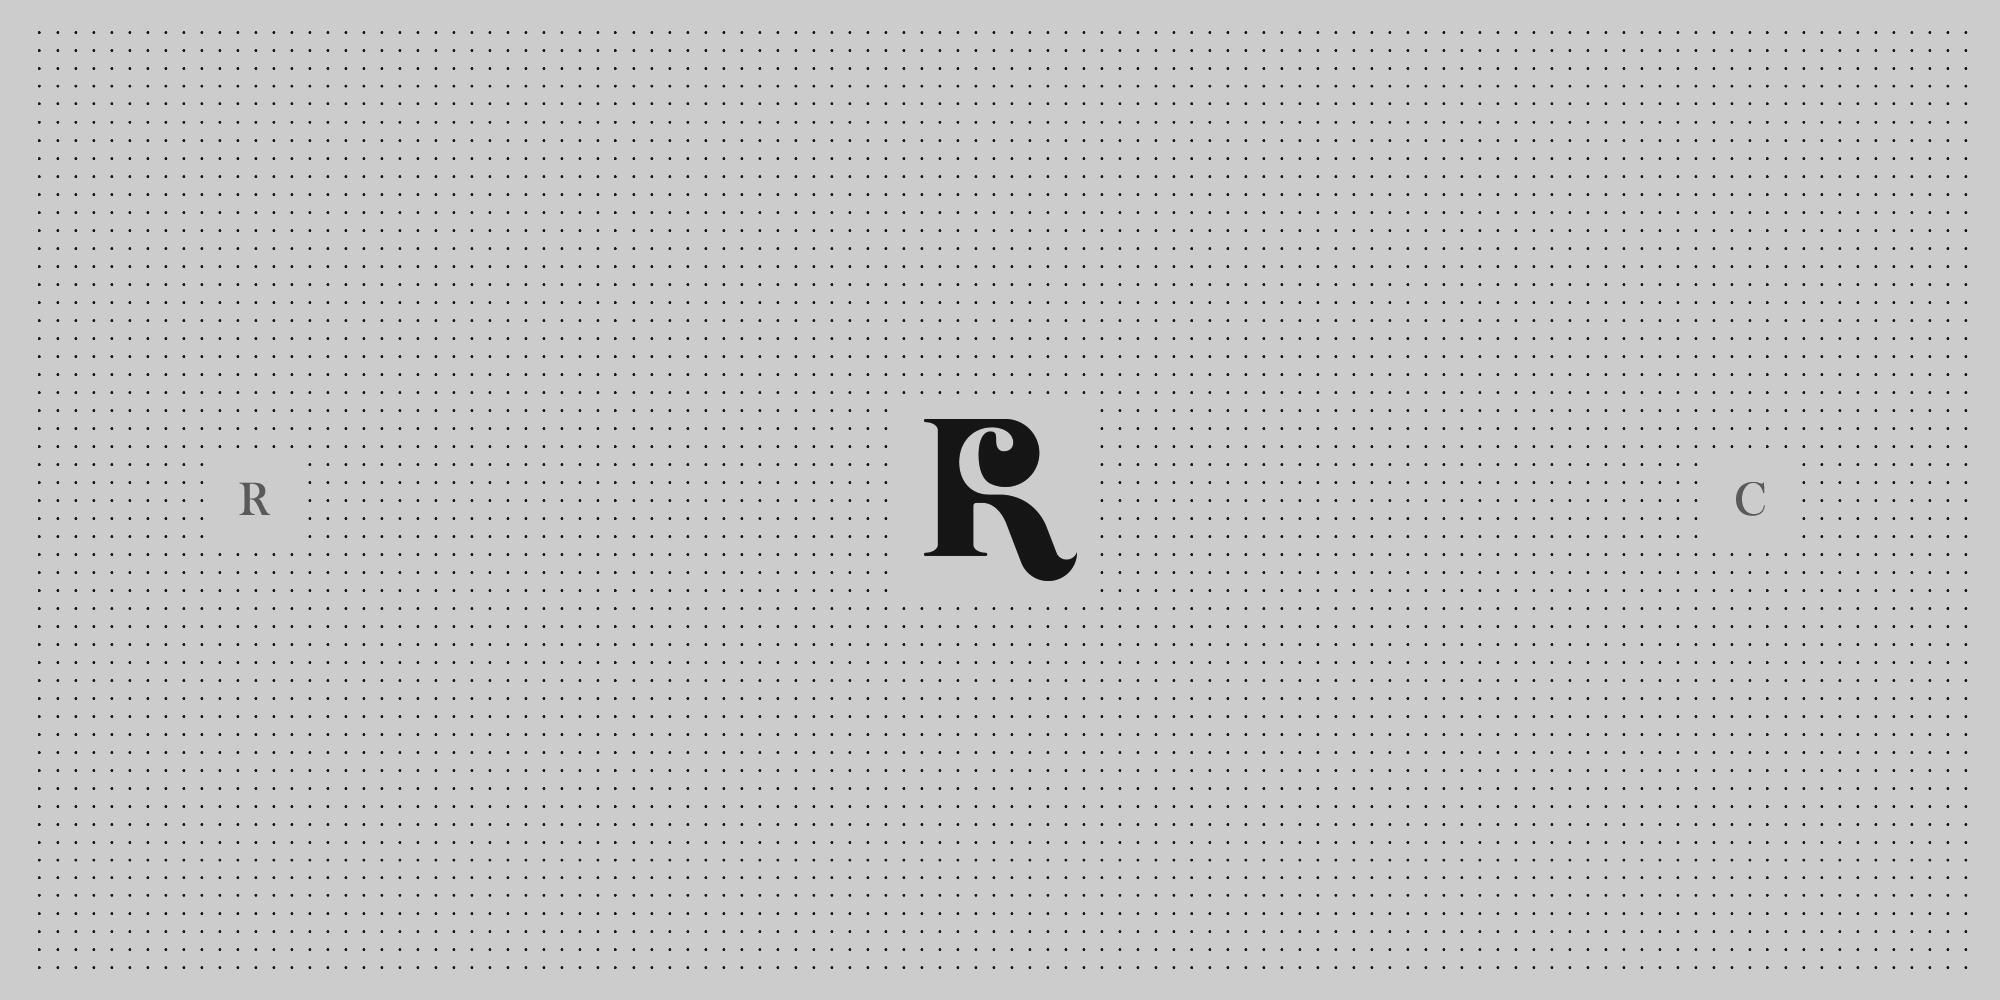 Rc.brand